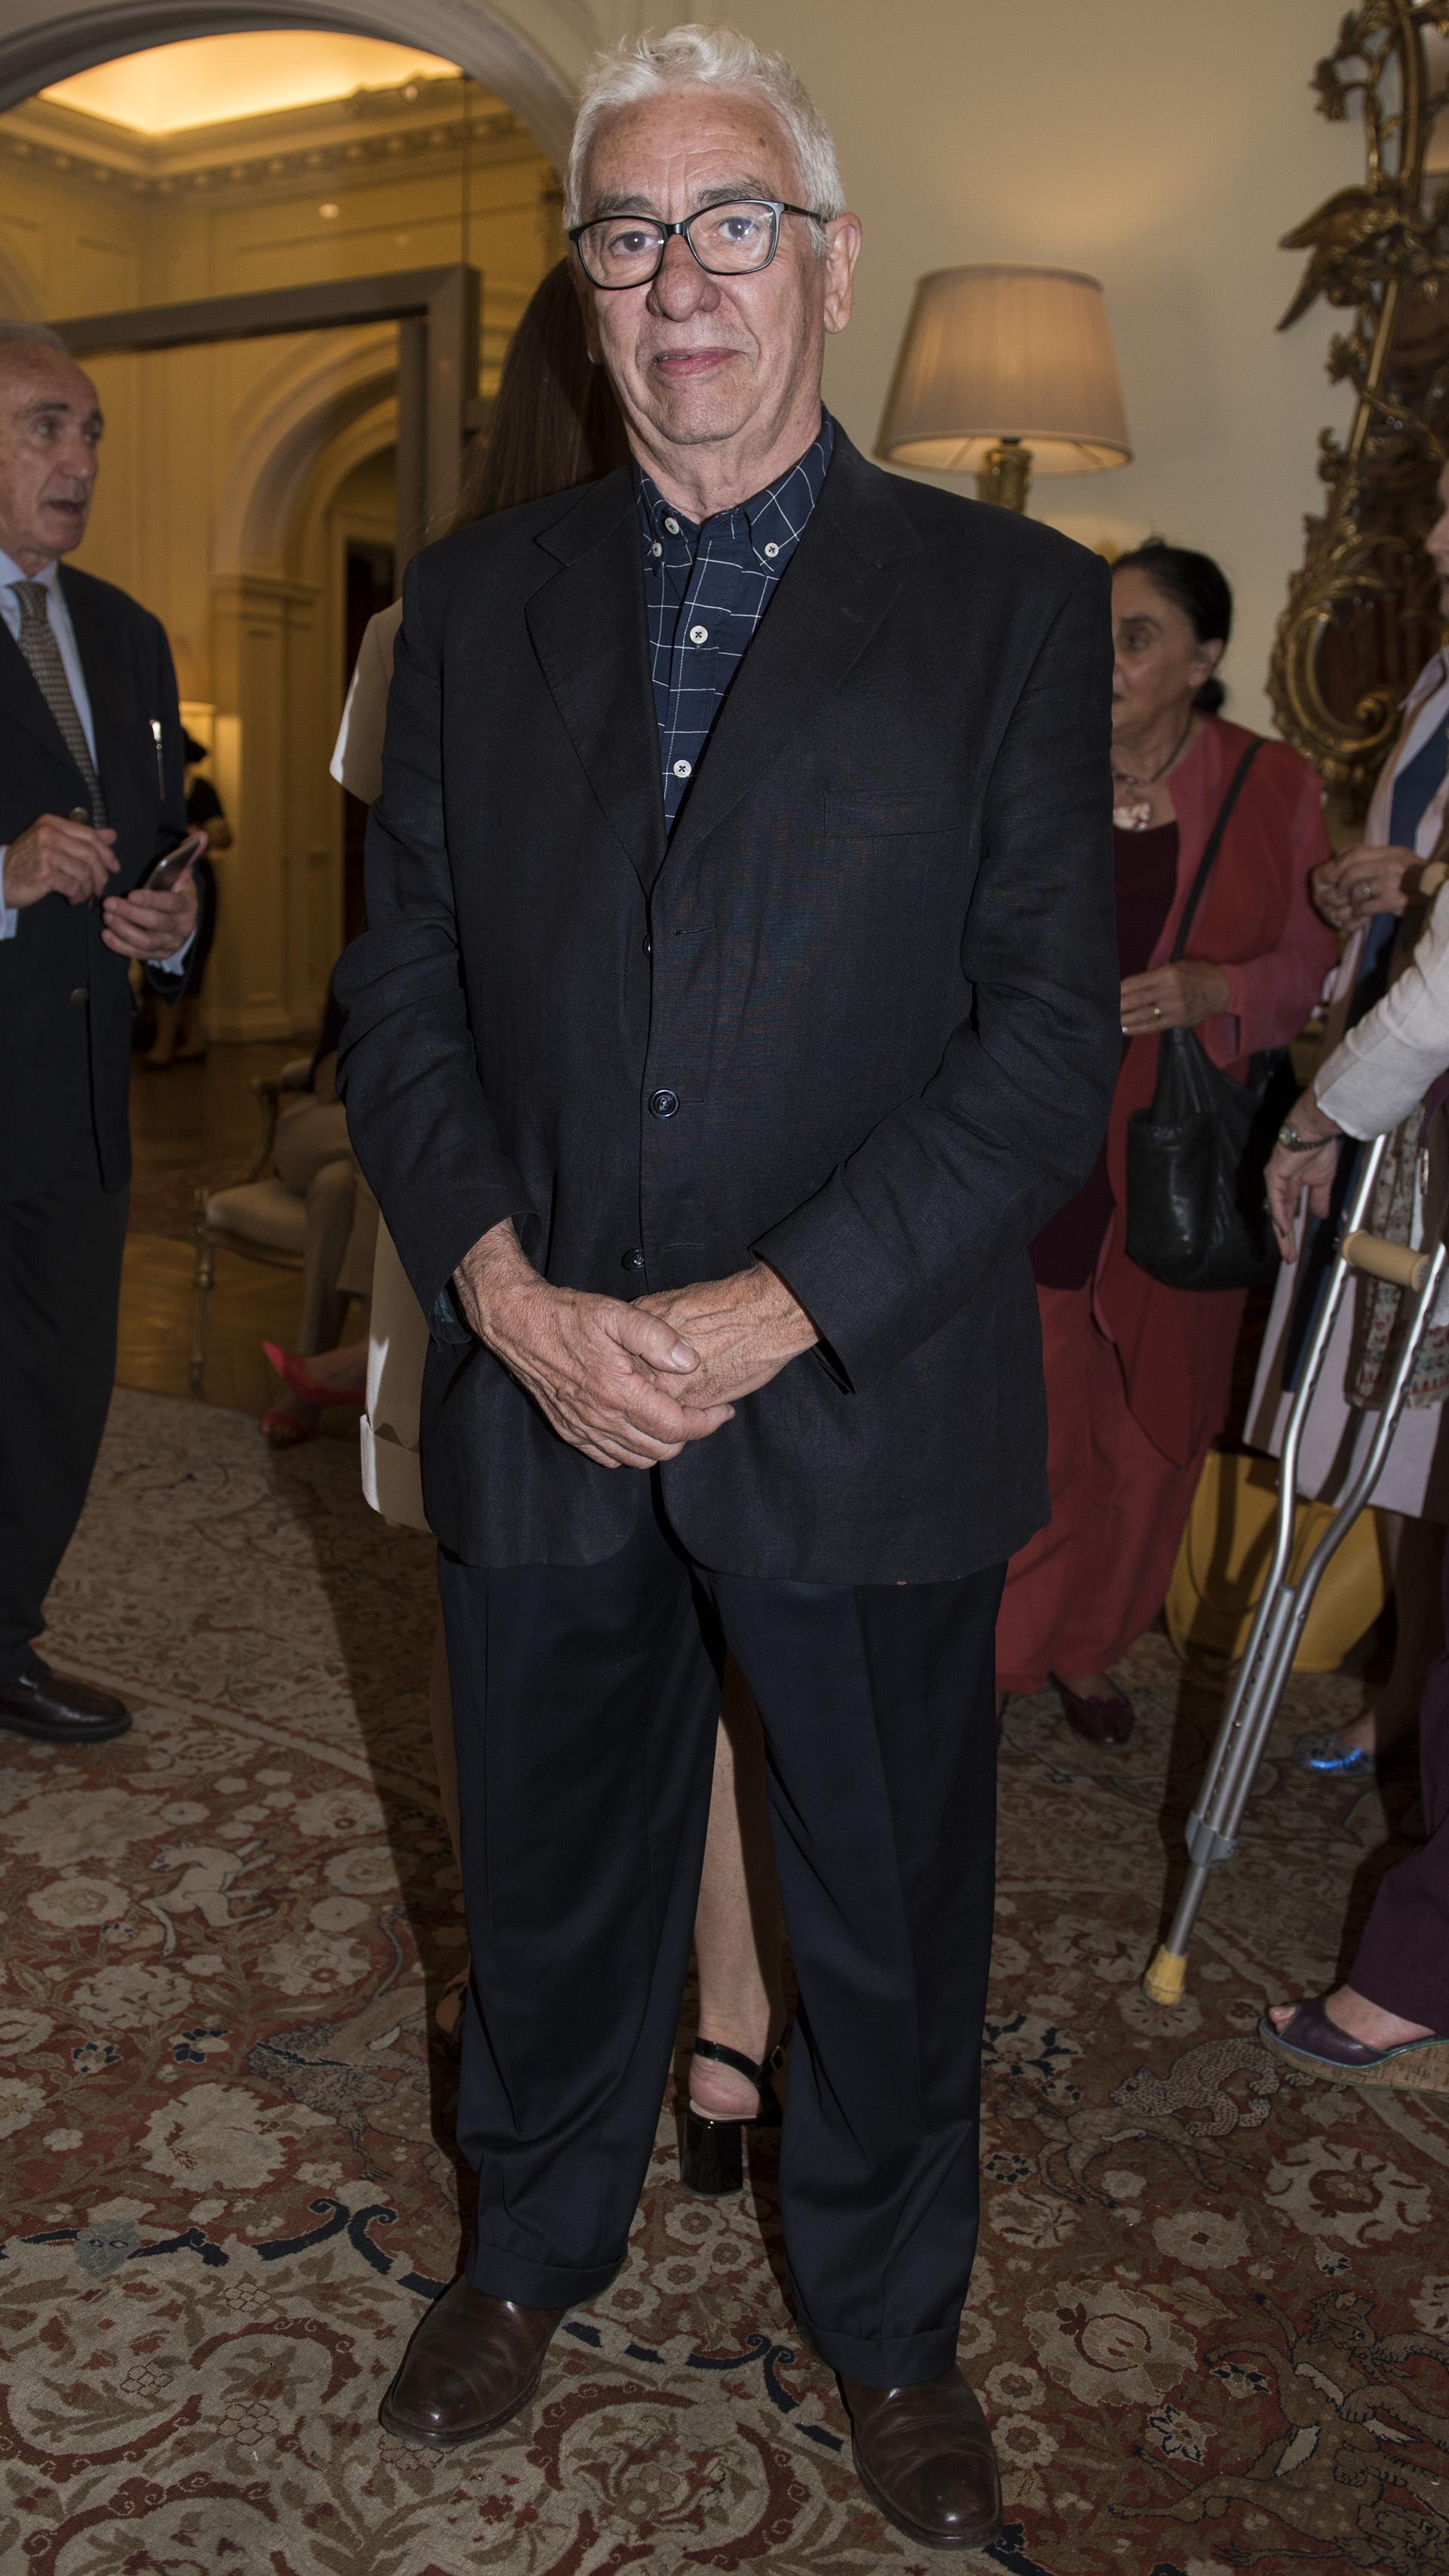 El orfebre Juan Carlos Pallarols